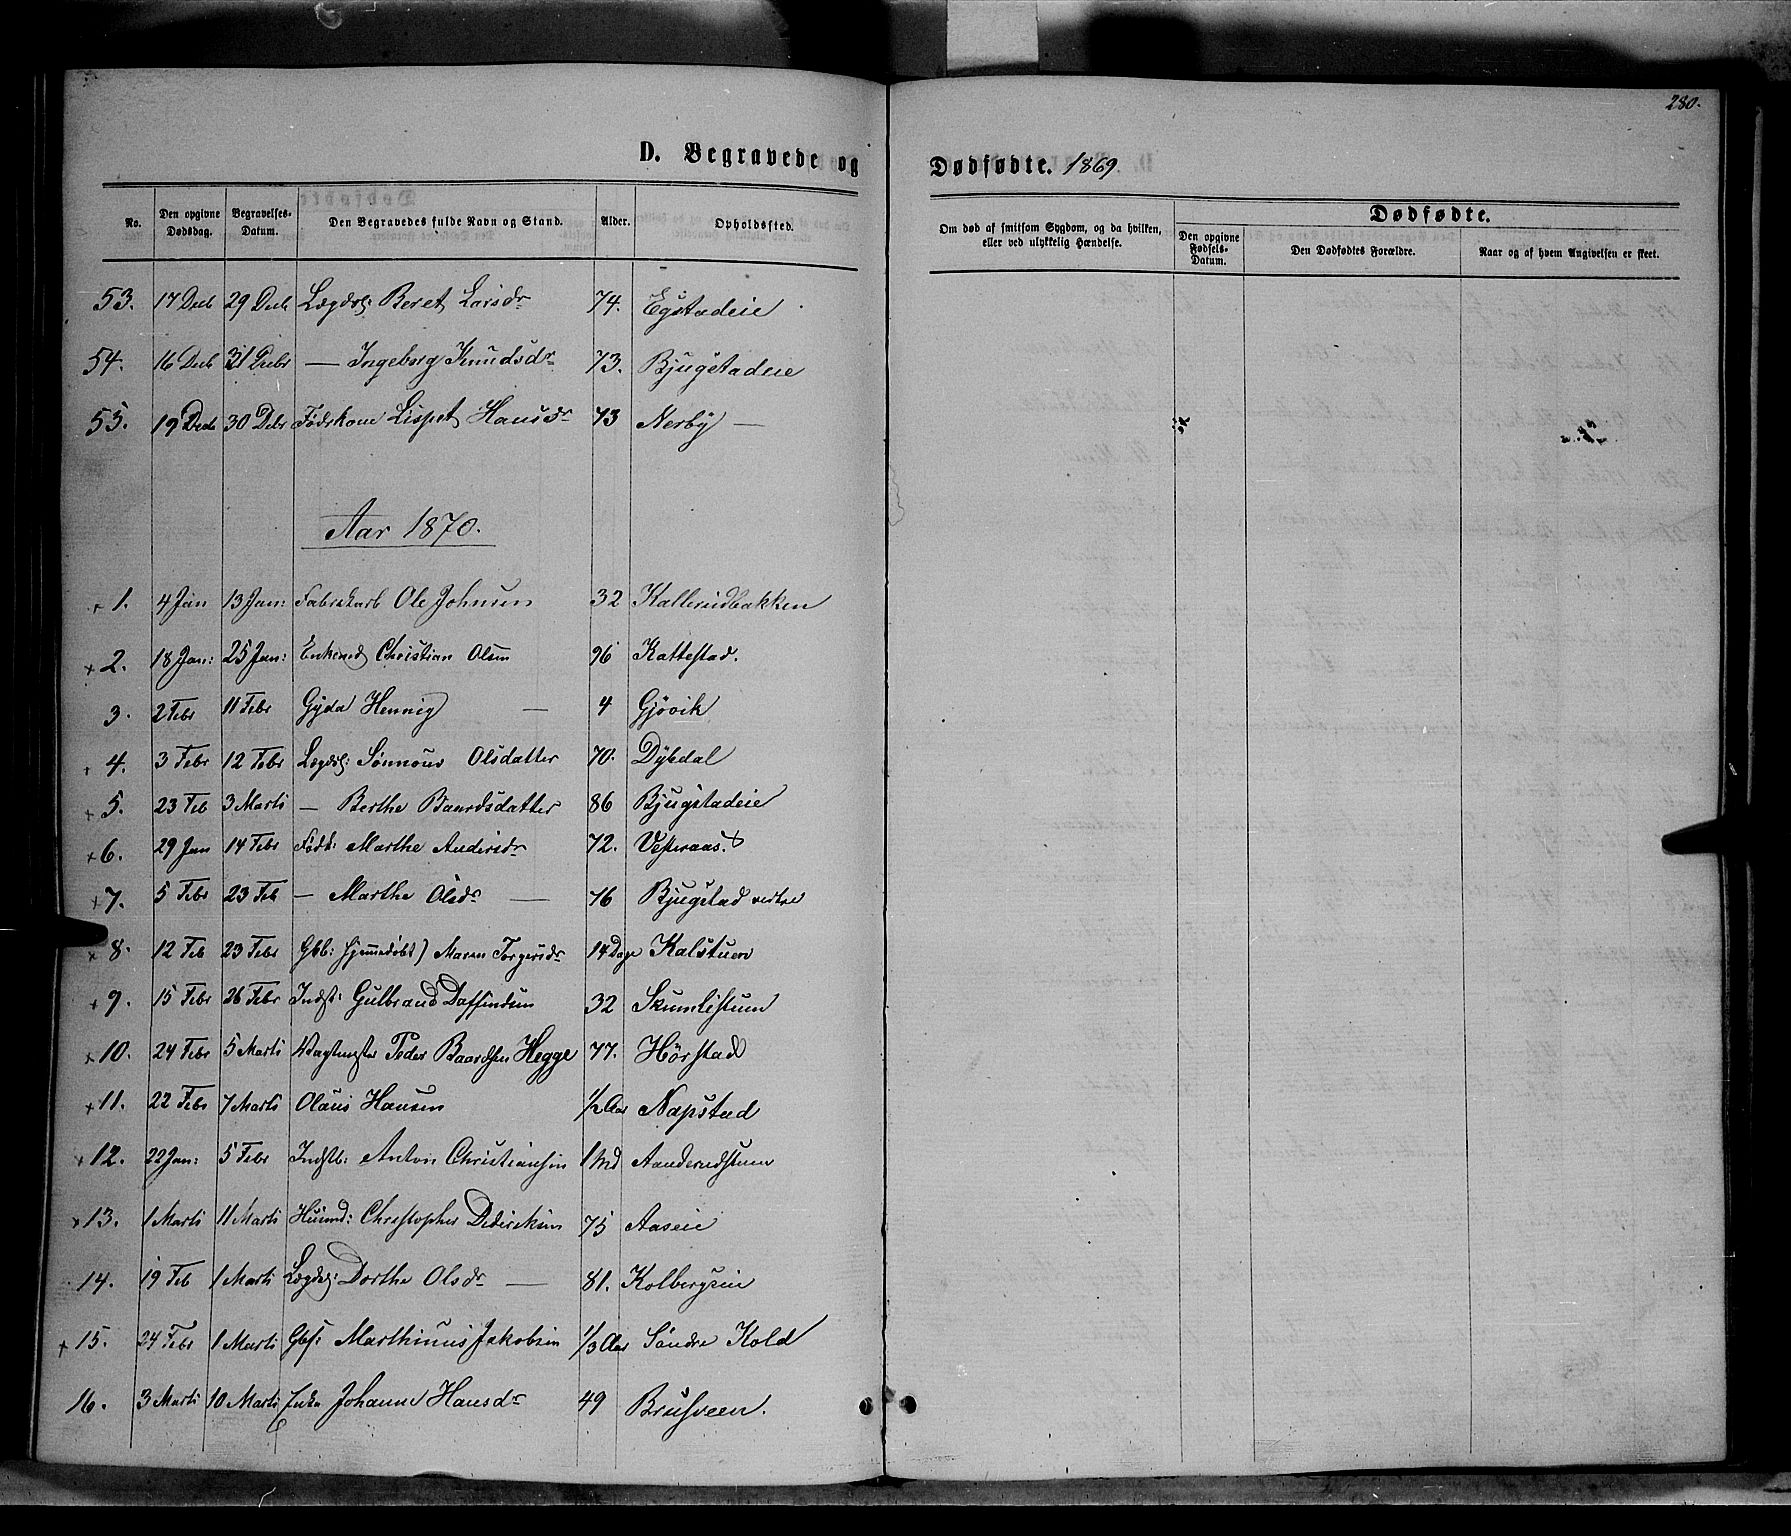 SAH, Vardal prestekontor, H/Ha/Hab/L0006: Klokkerbok nr. 6, 1869-1881, s. 280